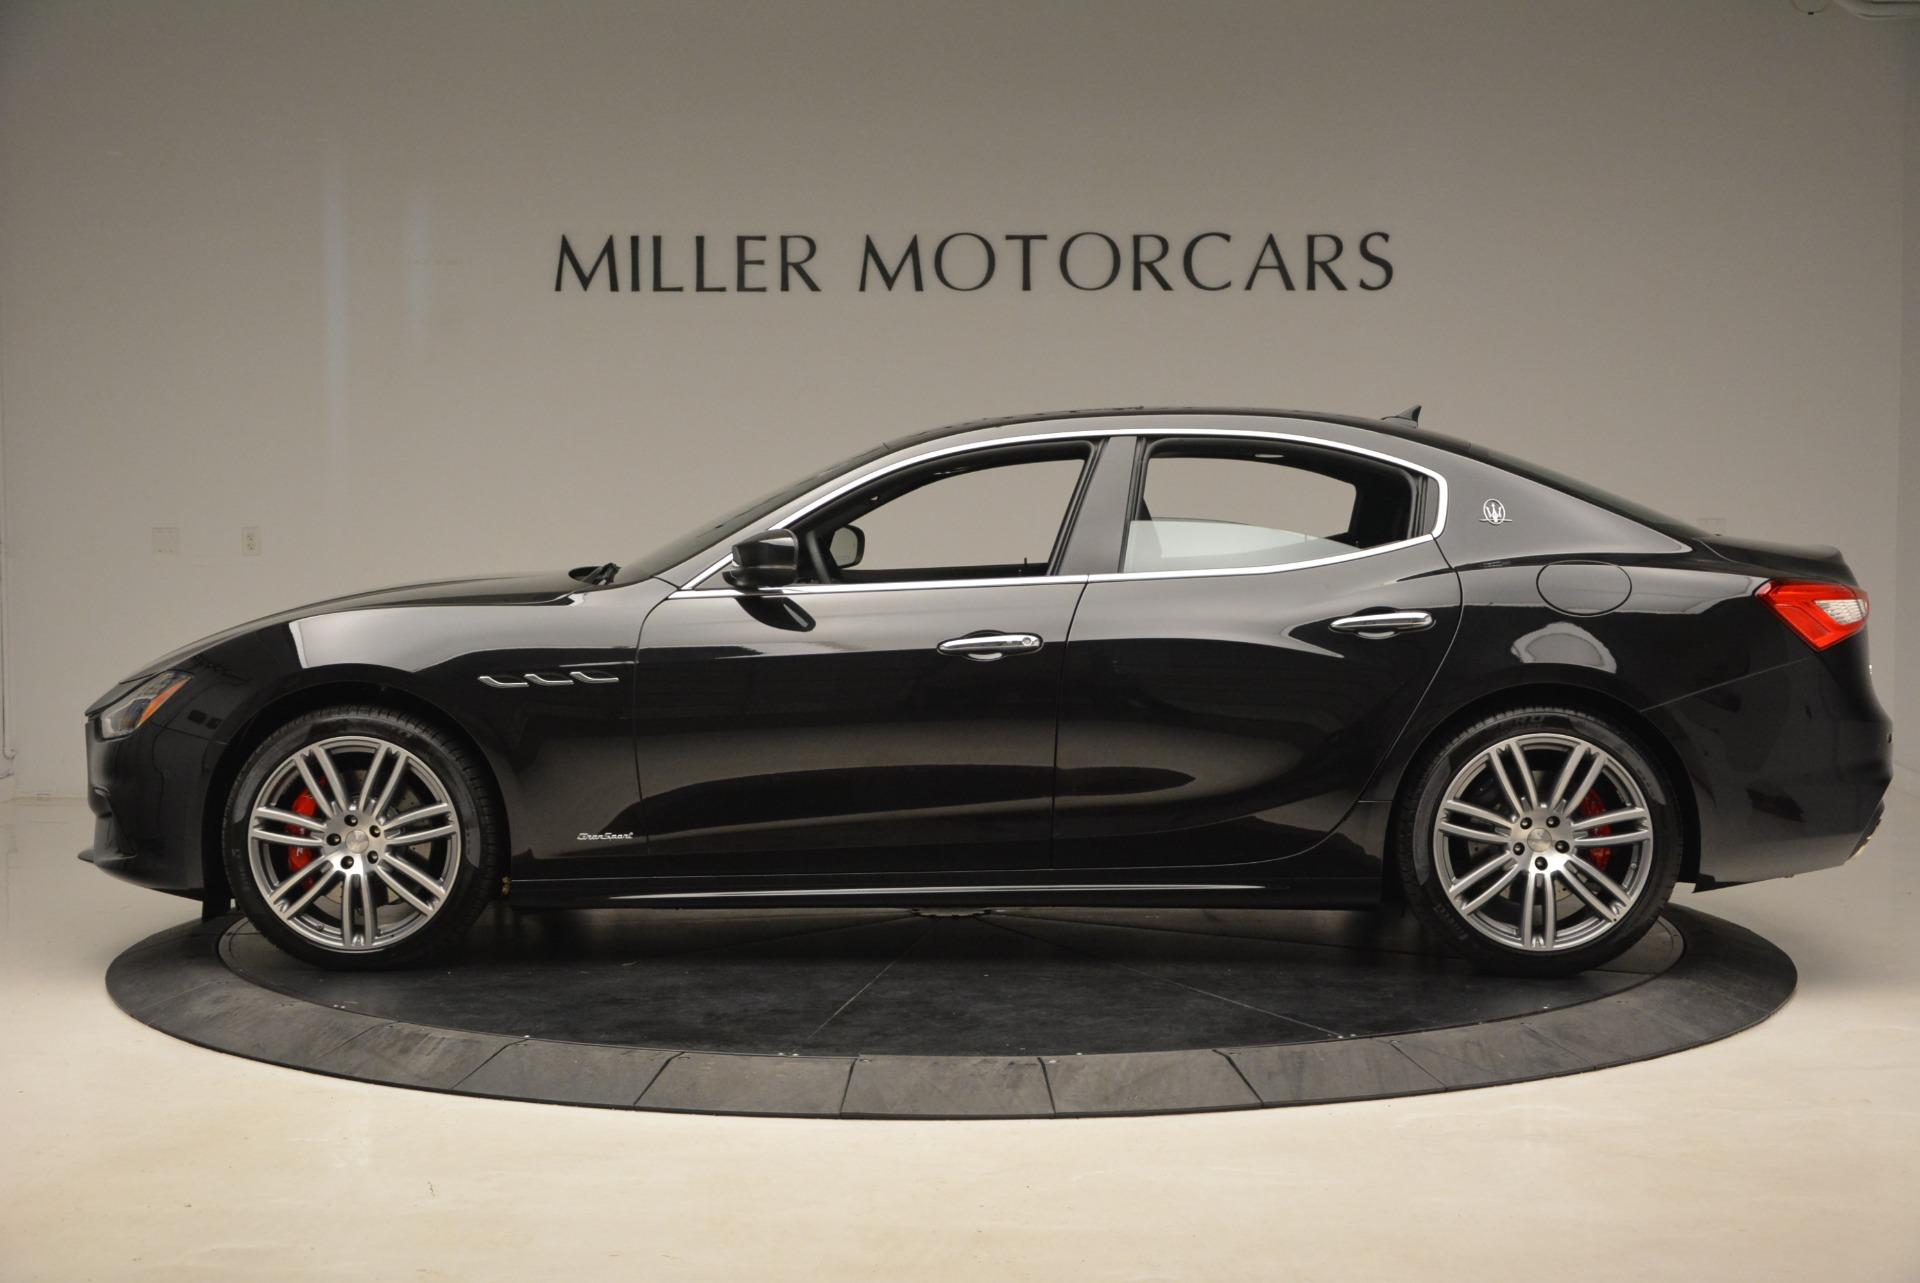 New 2018 Maserati Ghibli S Q4 GranSport For Sale In Greenwich, CT 1931_p3